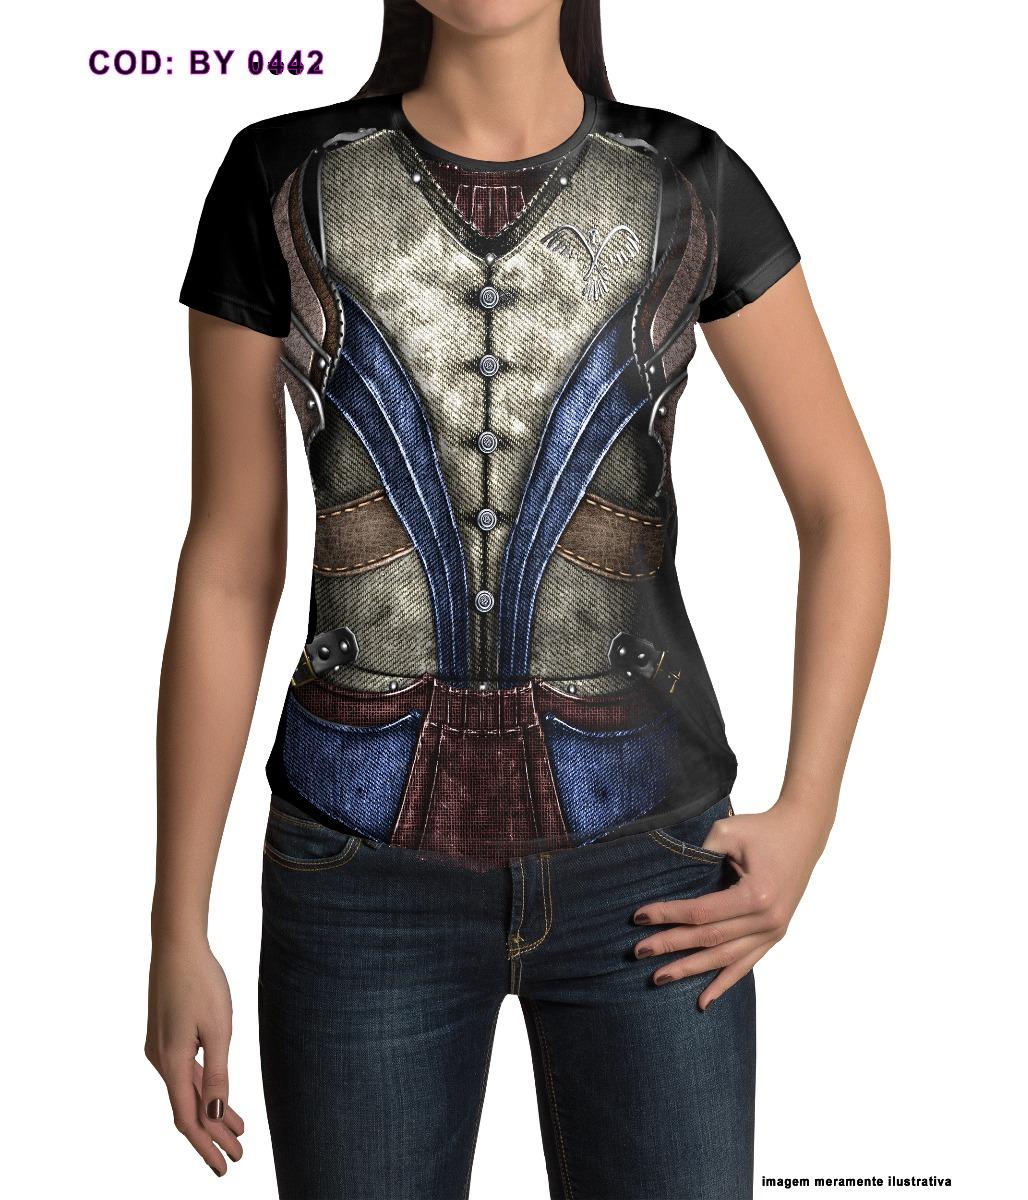 55895180a Camiseta Baby Look Feminina Traje Medieval - R  54